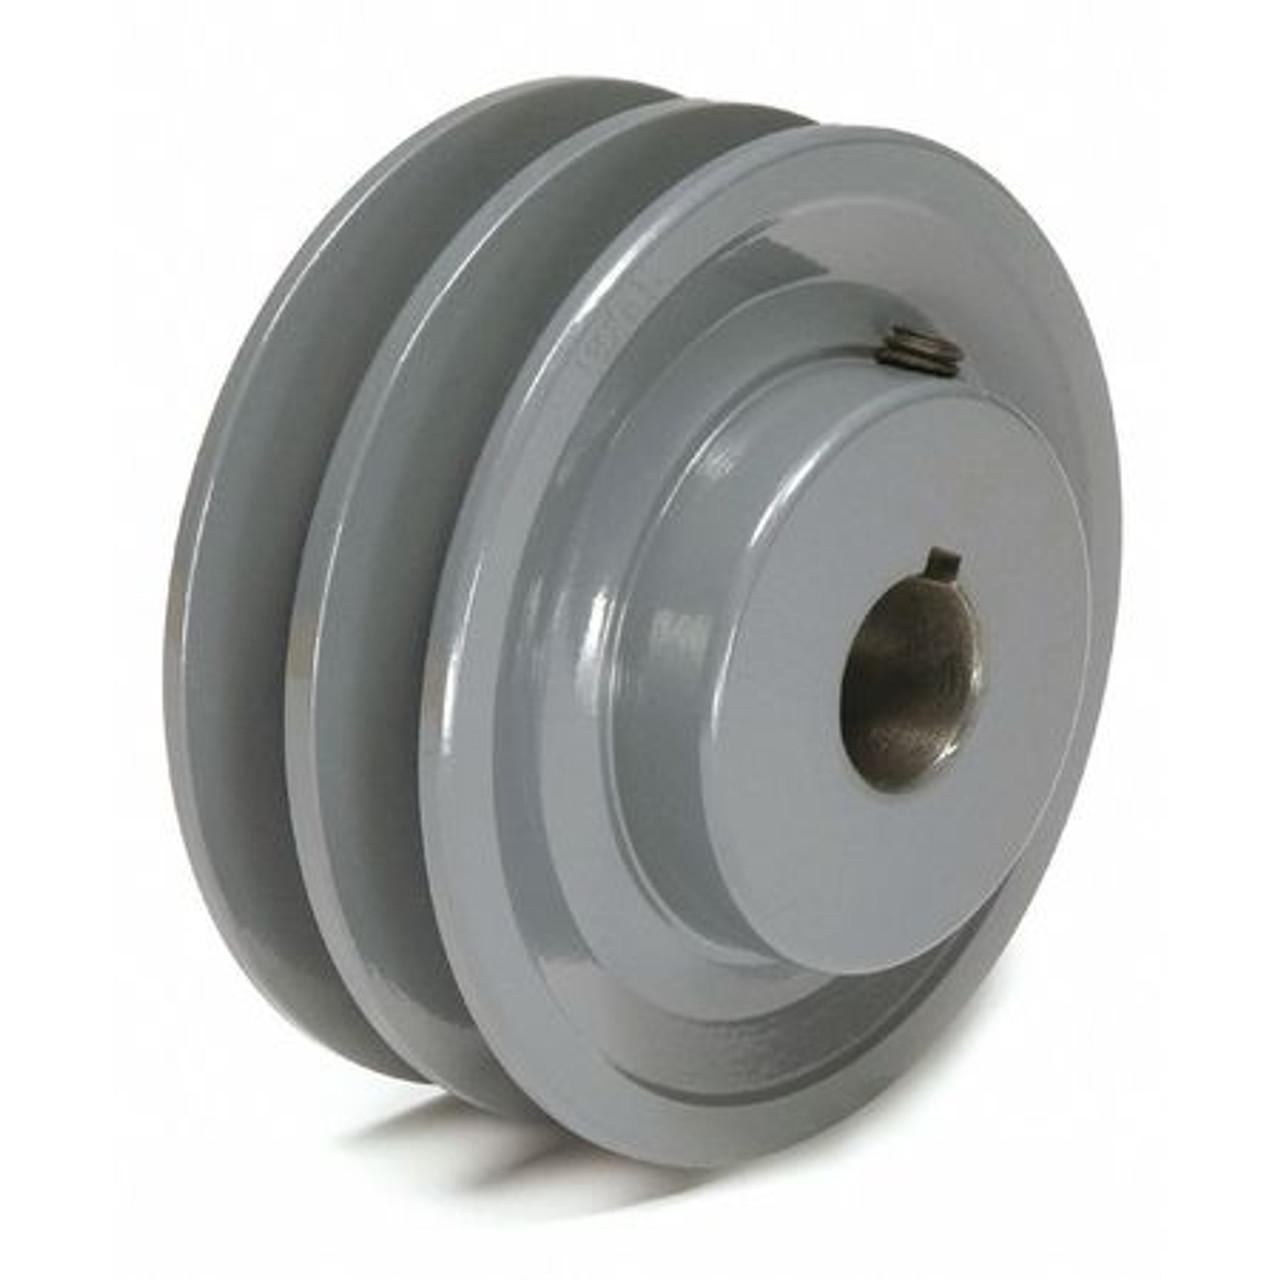 D/&D PowerDrive 3048-8M-35 Timing Belt